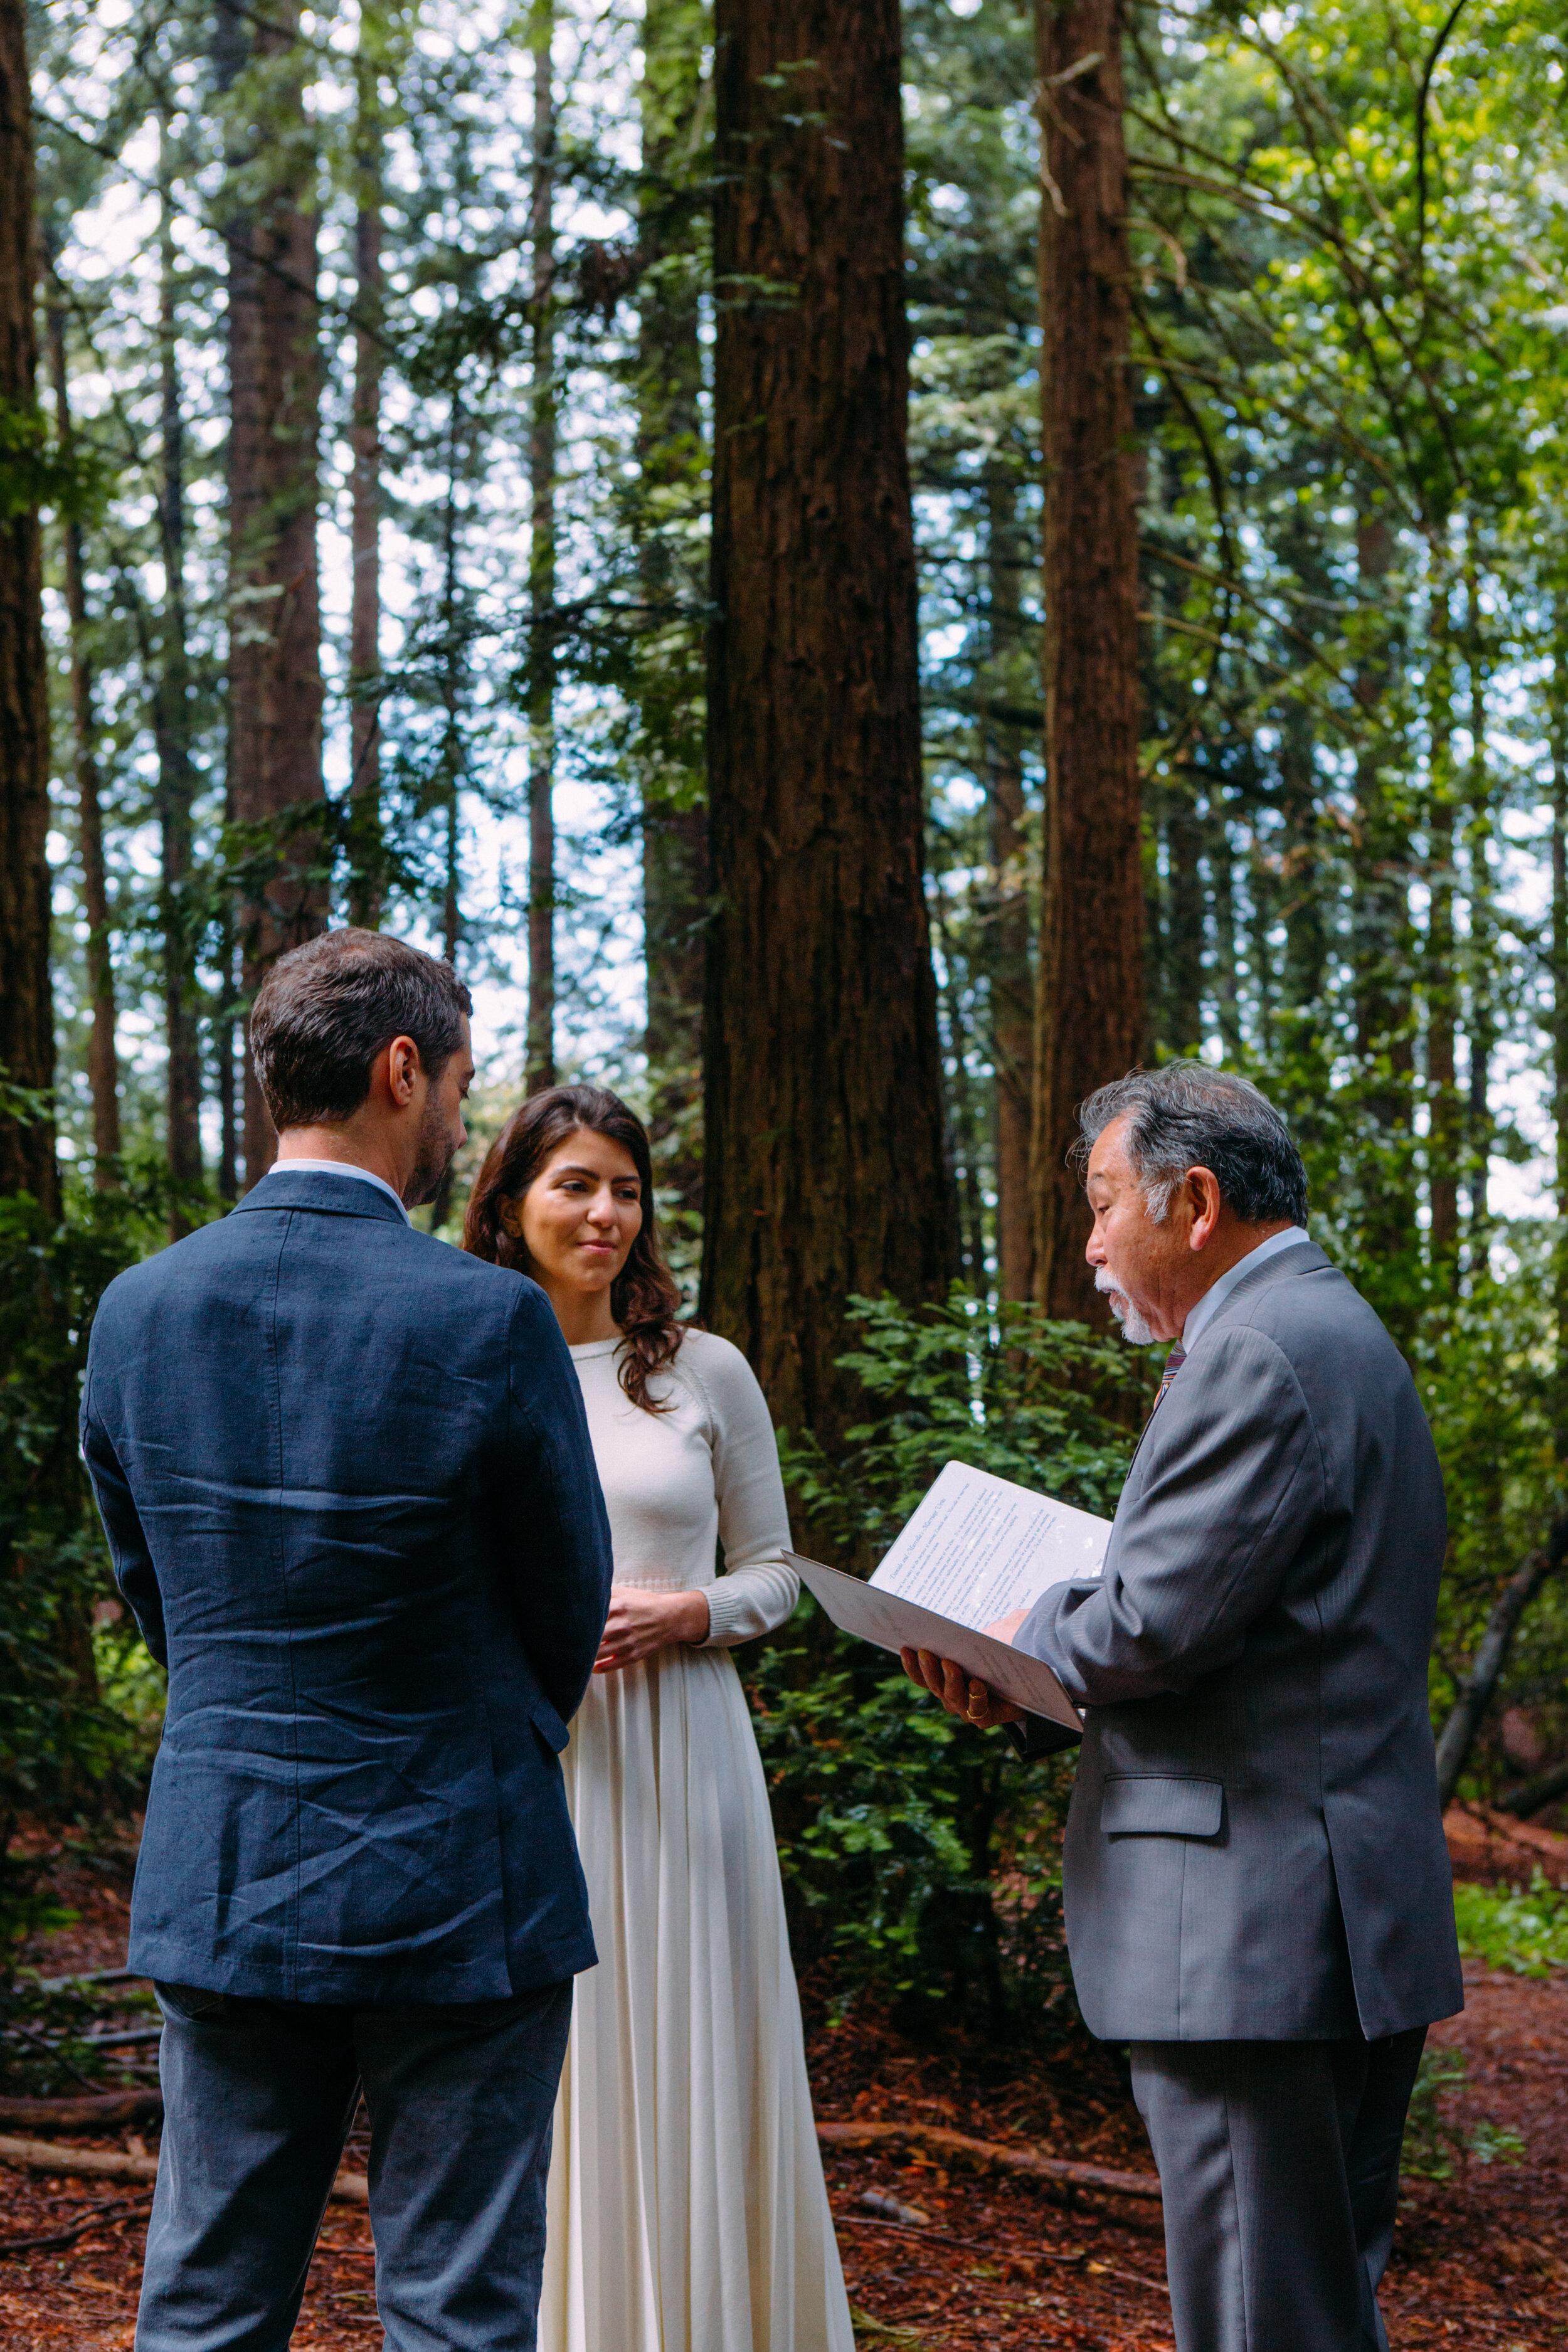 20190716-San Francisco-Redwood Regional Park-Marcella Daniele--14.jpg